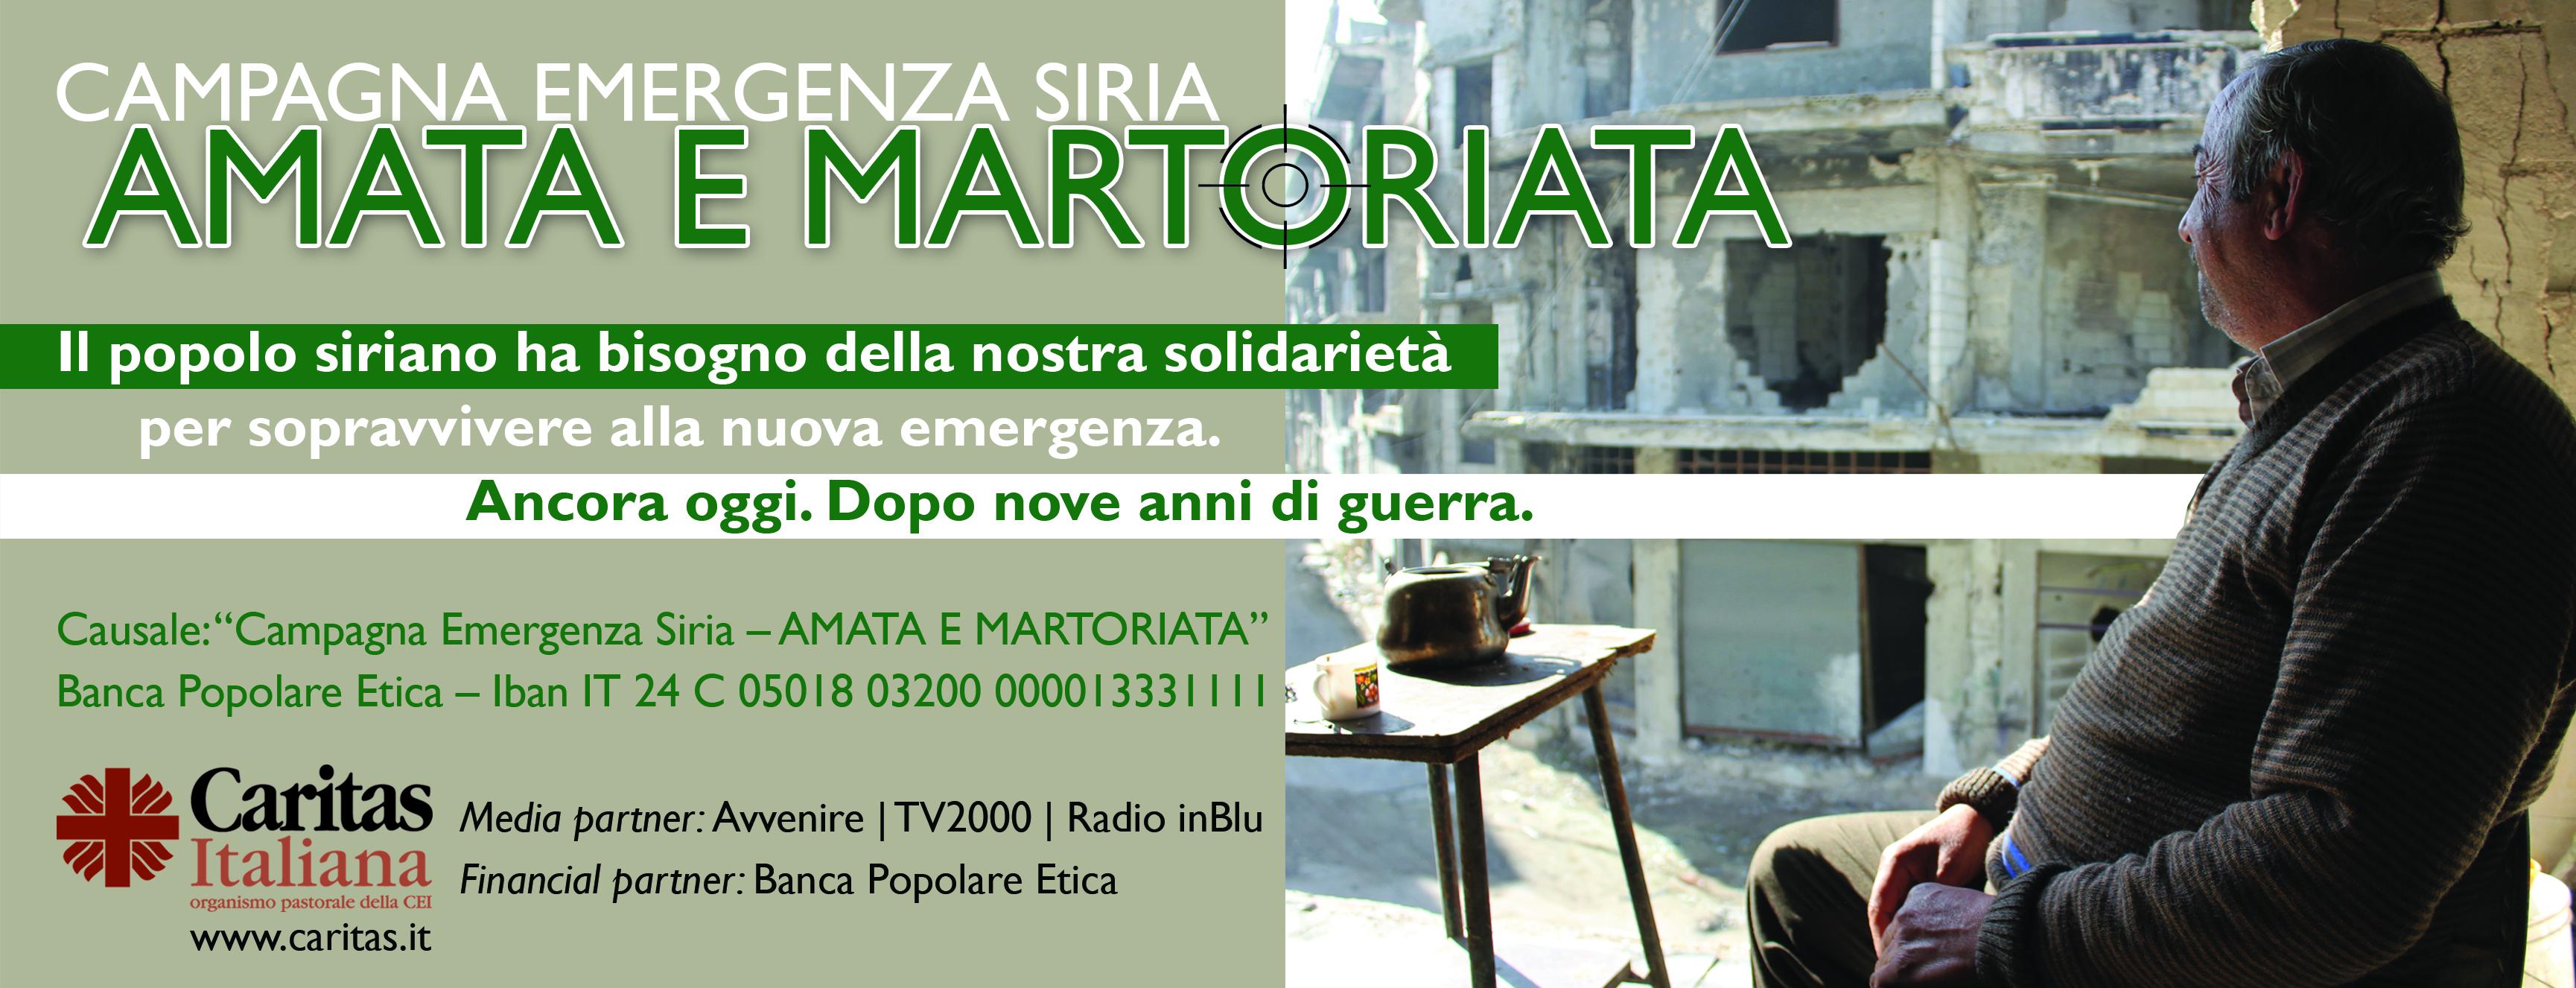 Caritas Italiana – Campagna Emergenza Siria